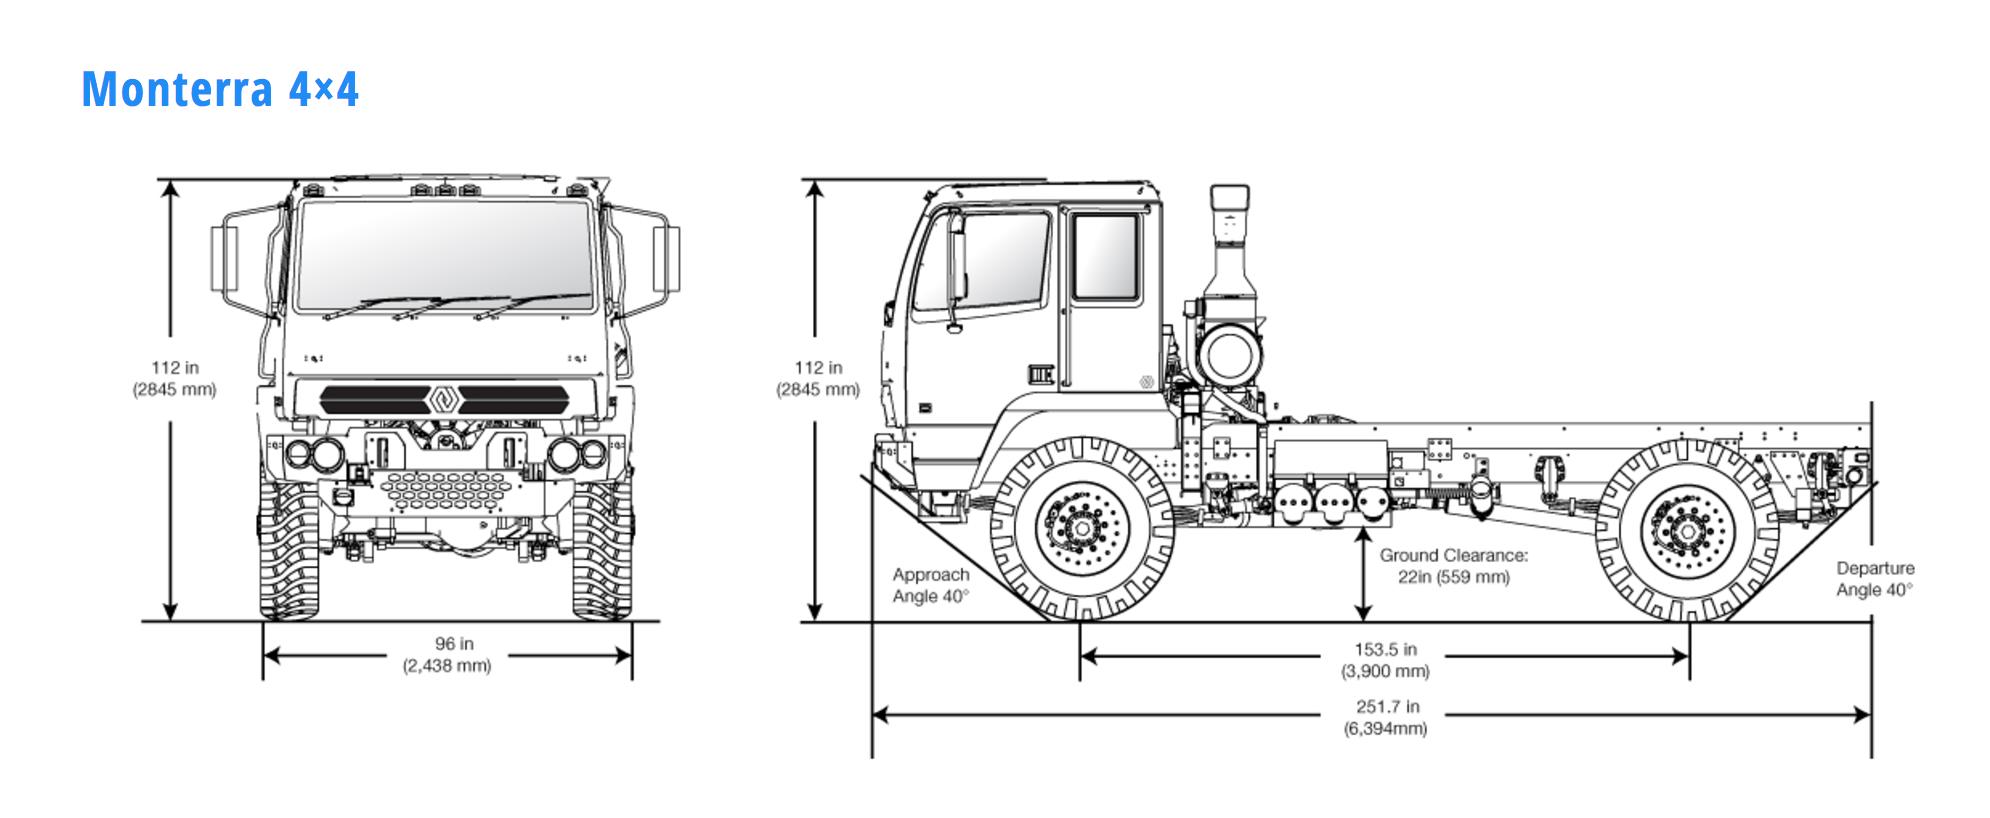 Fire Truck Wiring Diagram Electrical Diagrams Mack Pump System Schematics International Engine Drivetrain Car